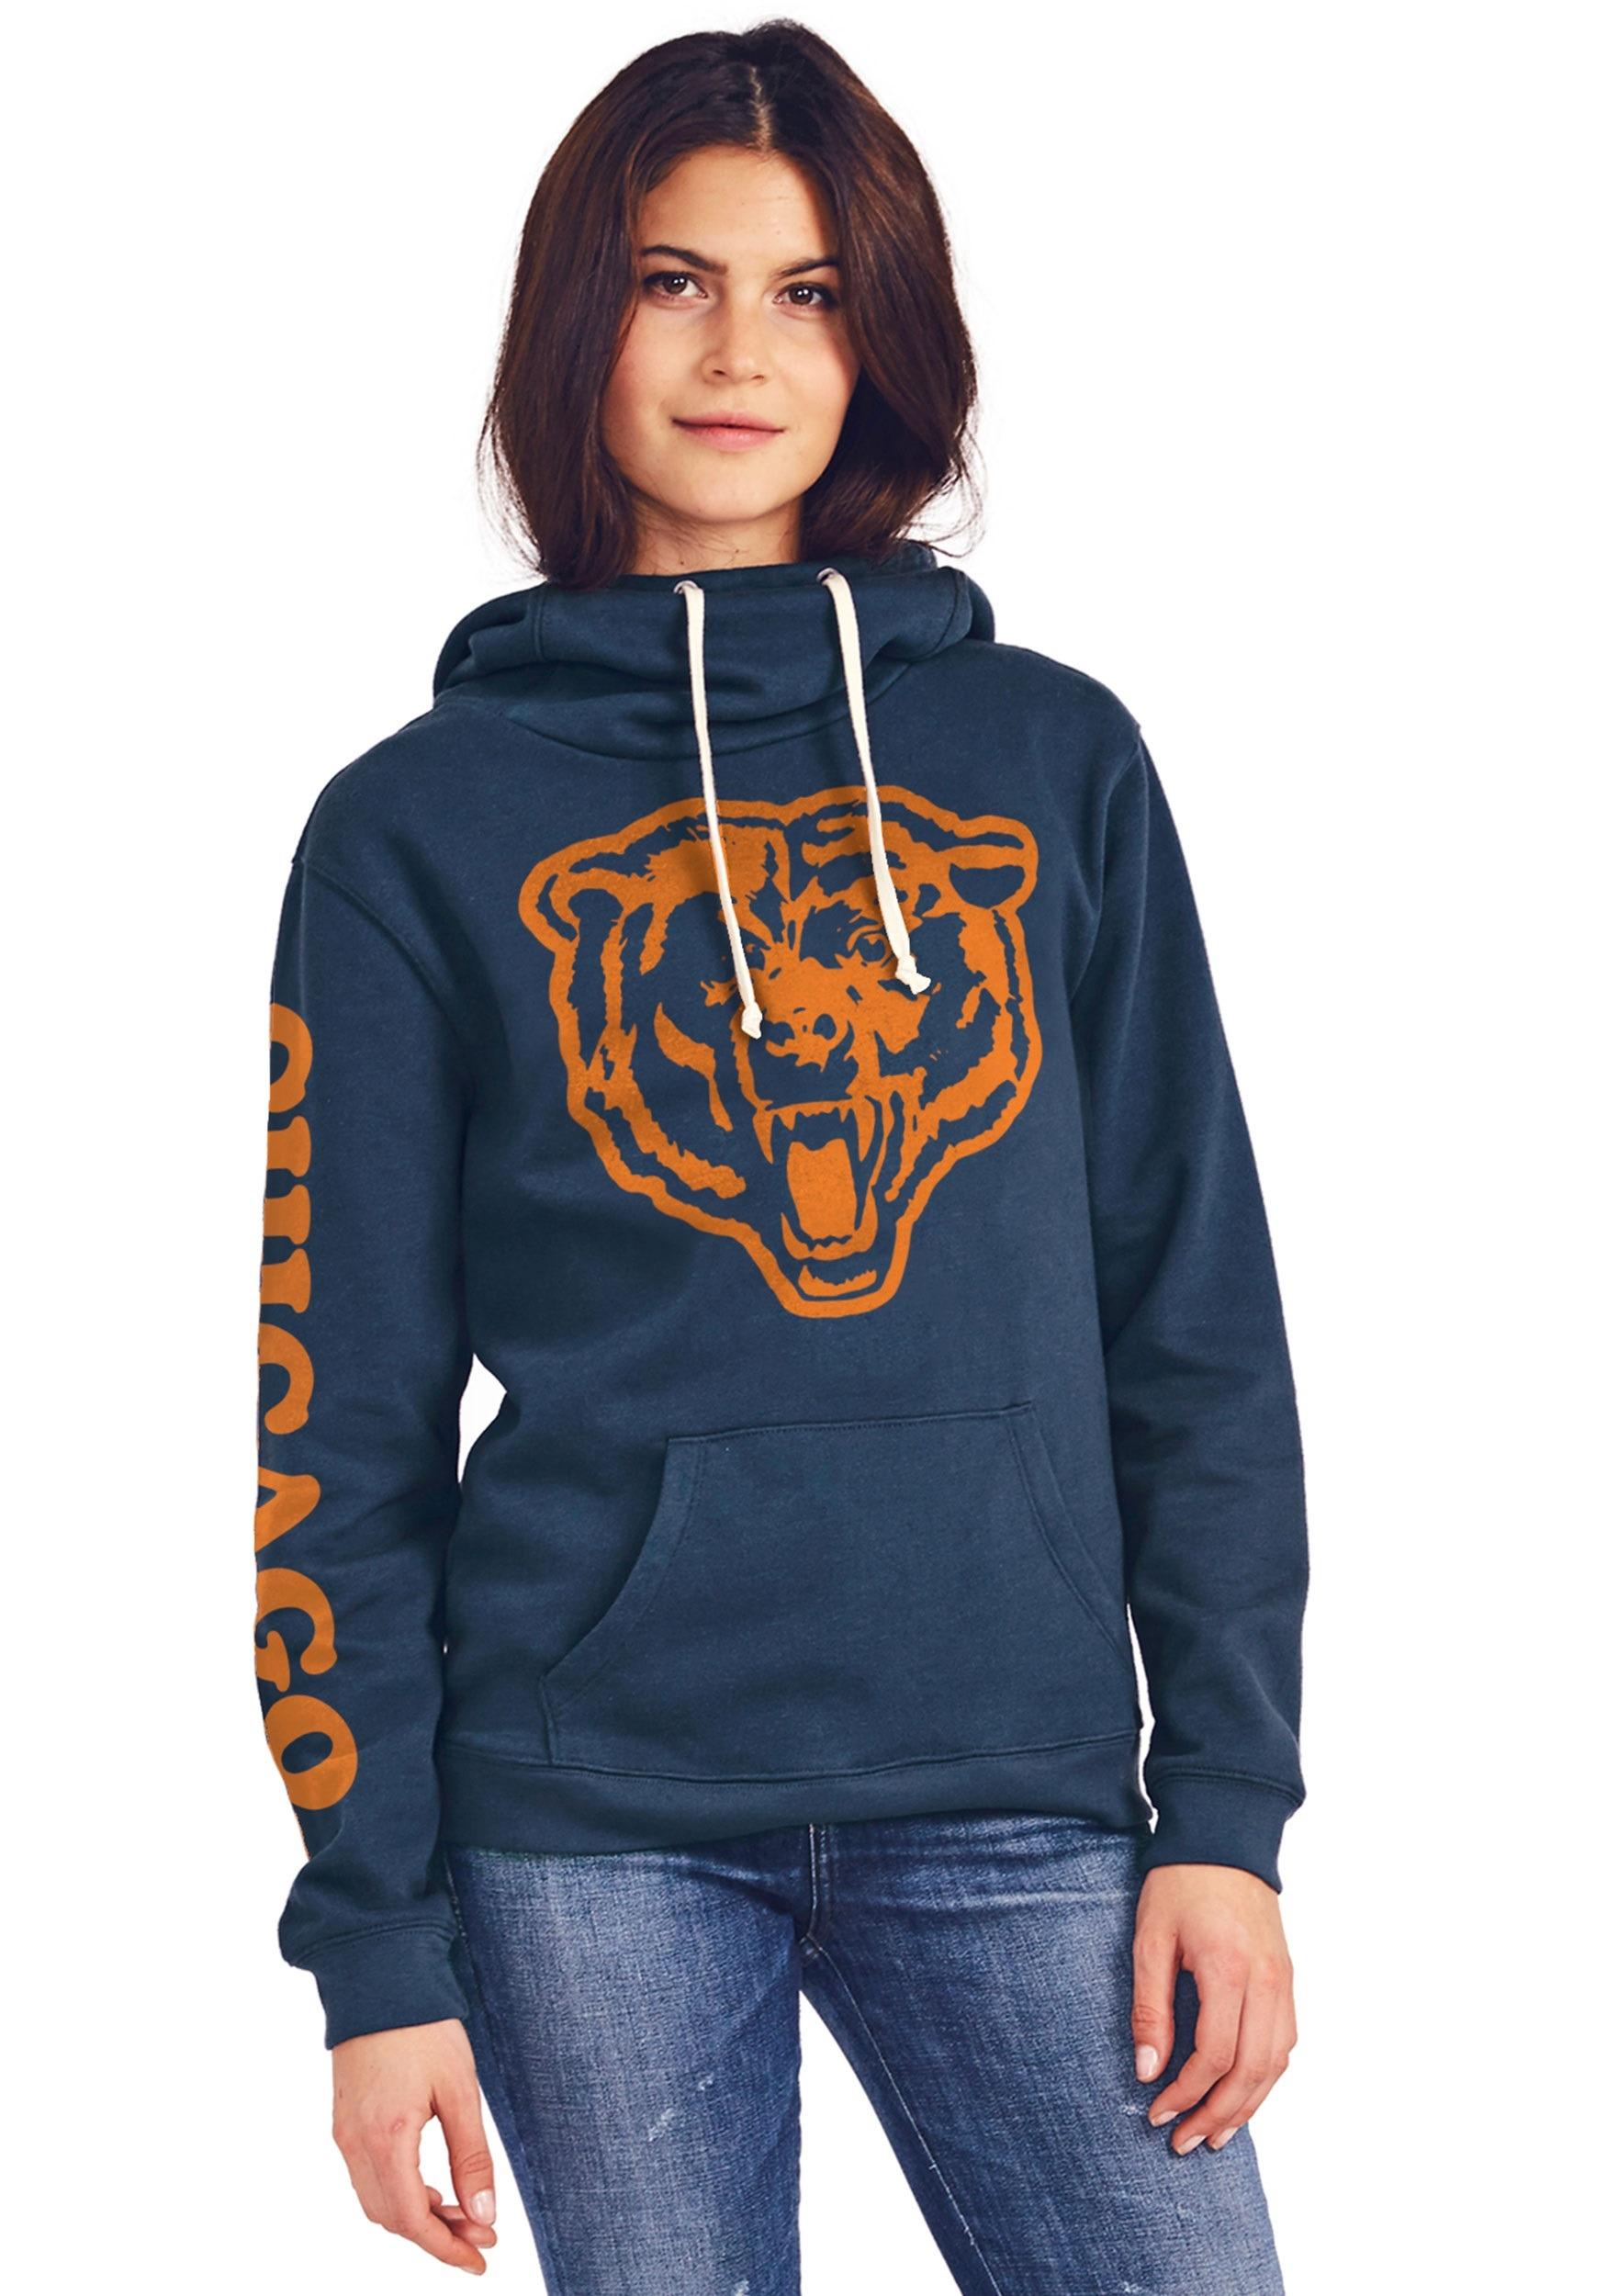 2a7b157b Chicago Bears Women's Cowl Neck Hooded Sweatshirt